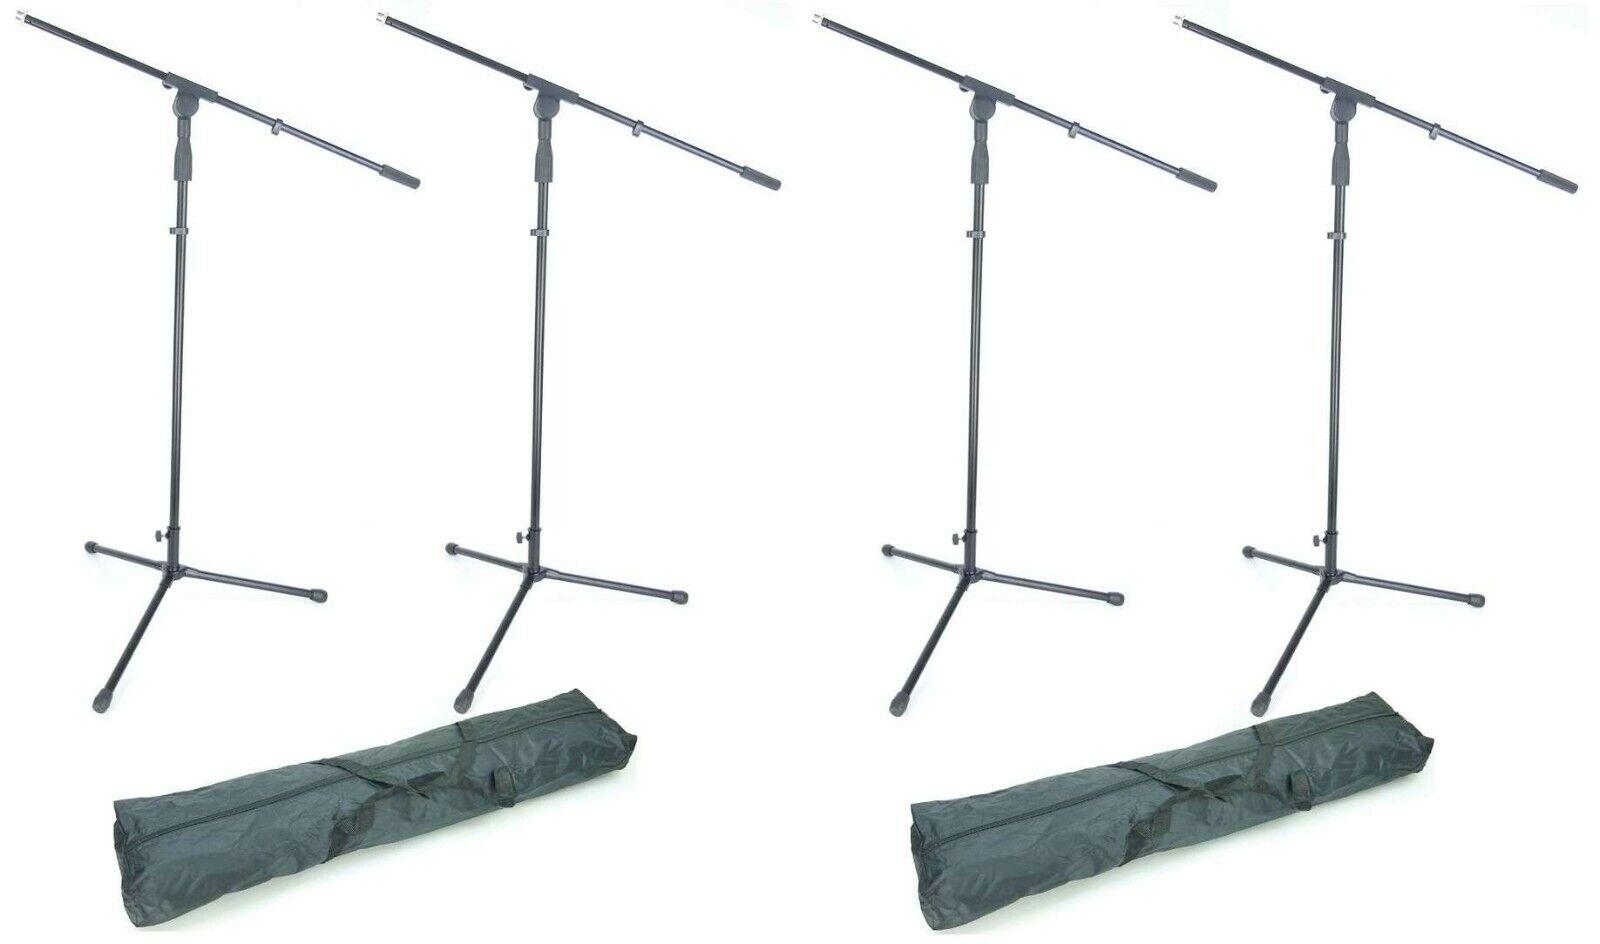 4 Professional Microphone Stand Tripod S22B + 2x Bag, Microphone Tripod Microphone Stand